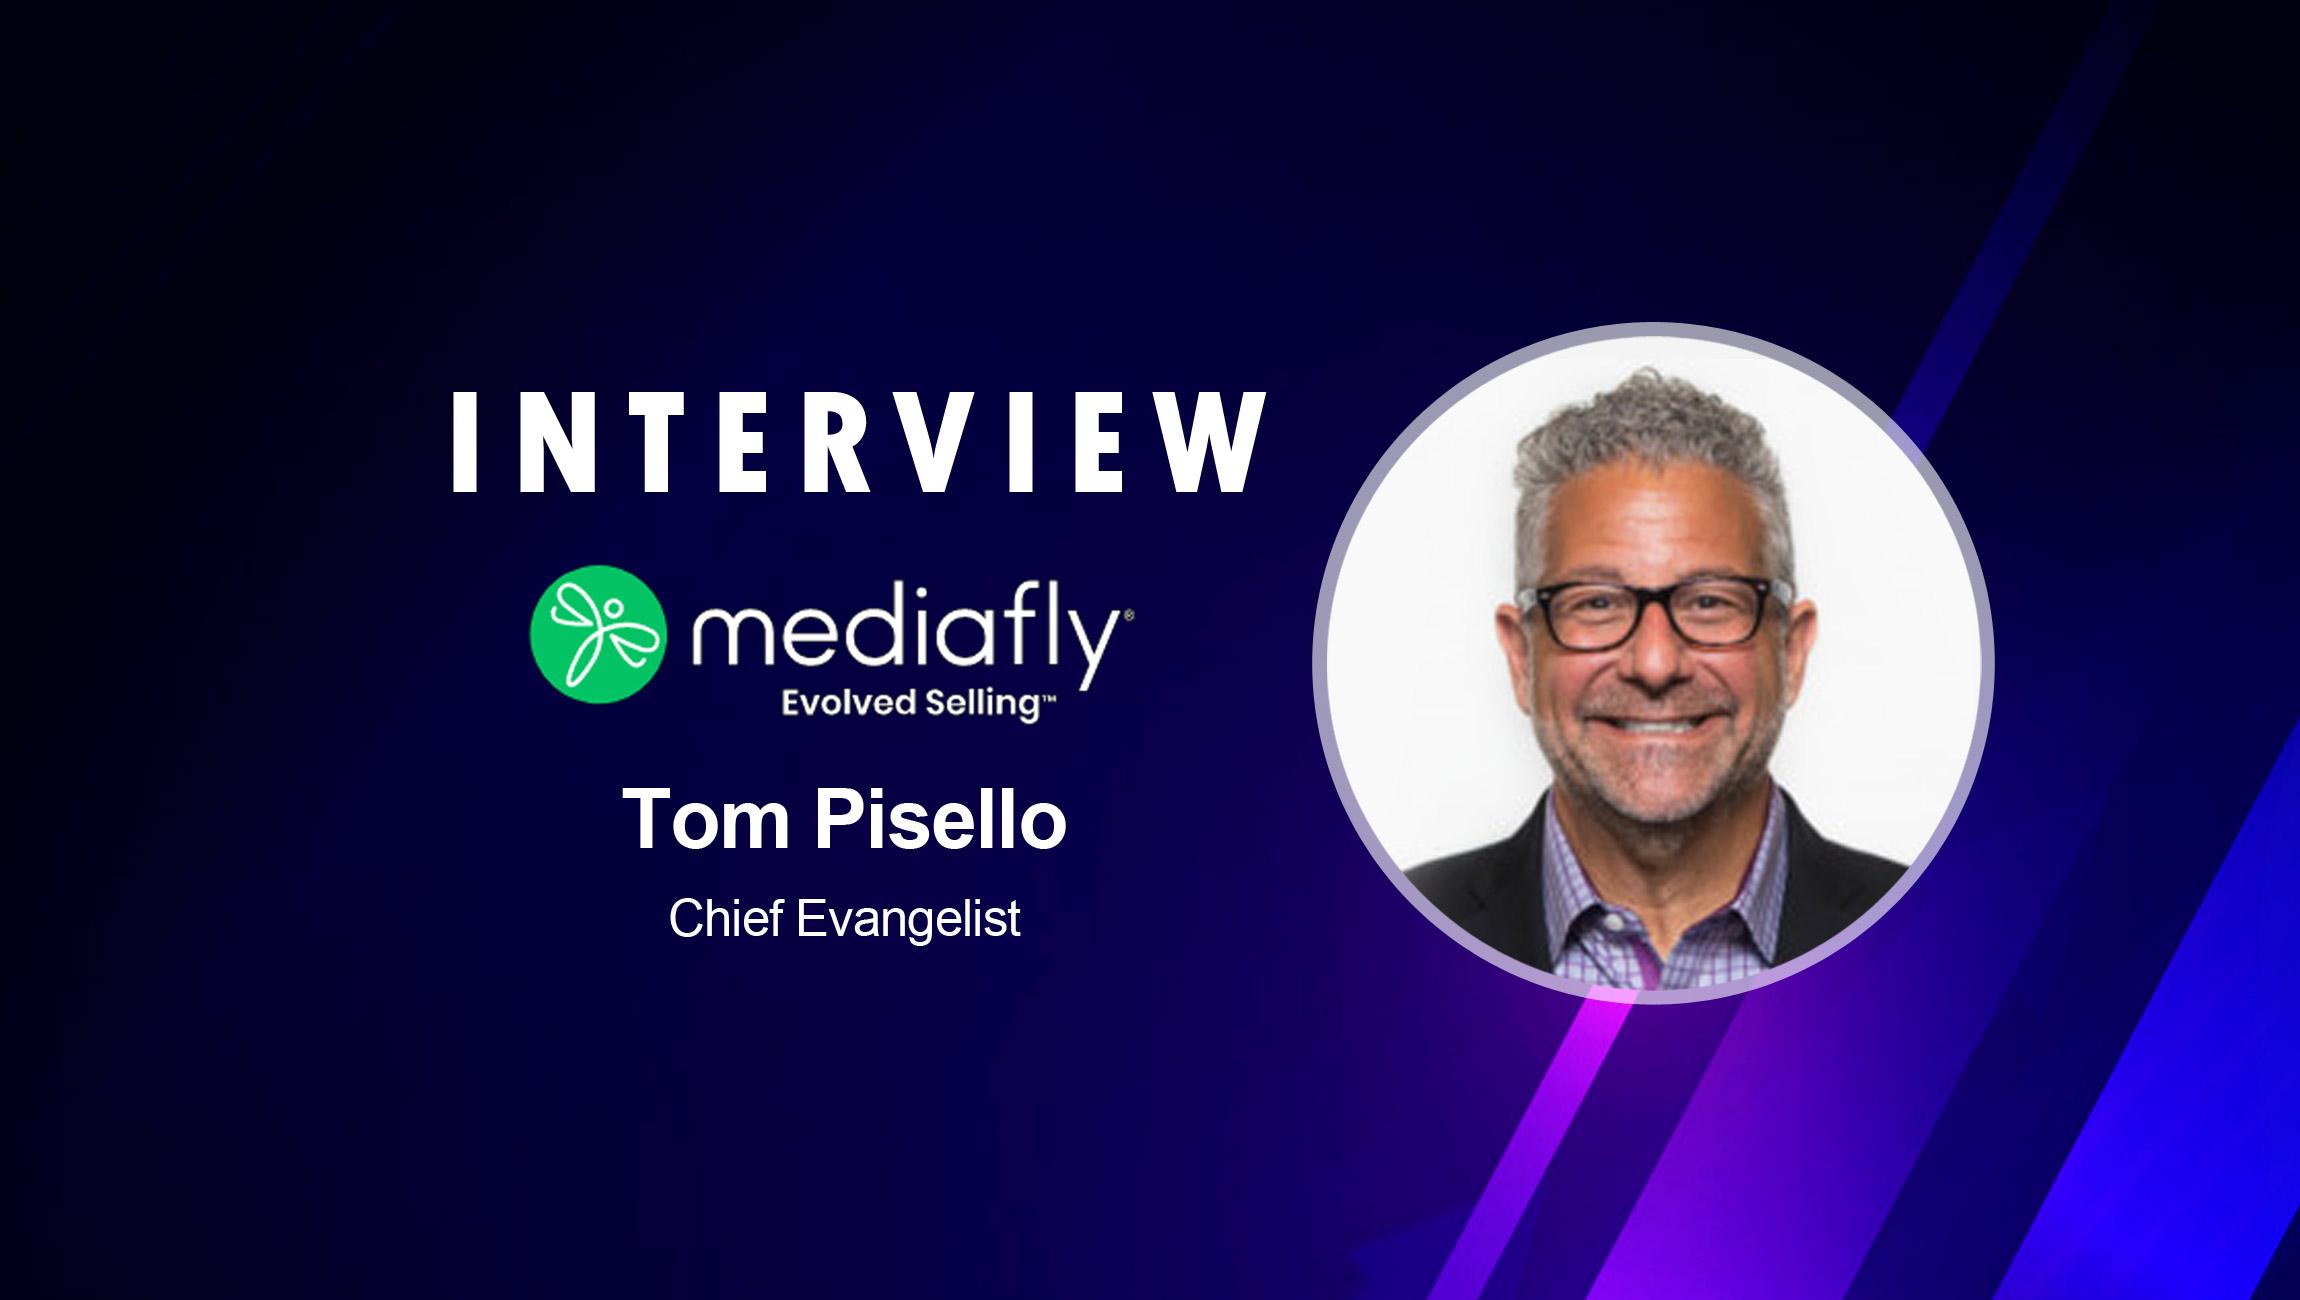 SalesTechStar Interview with Tom Pisello, Chief Evangelist at Mediafly